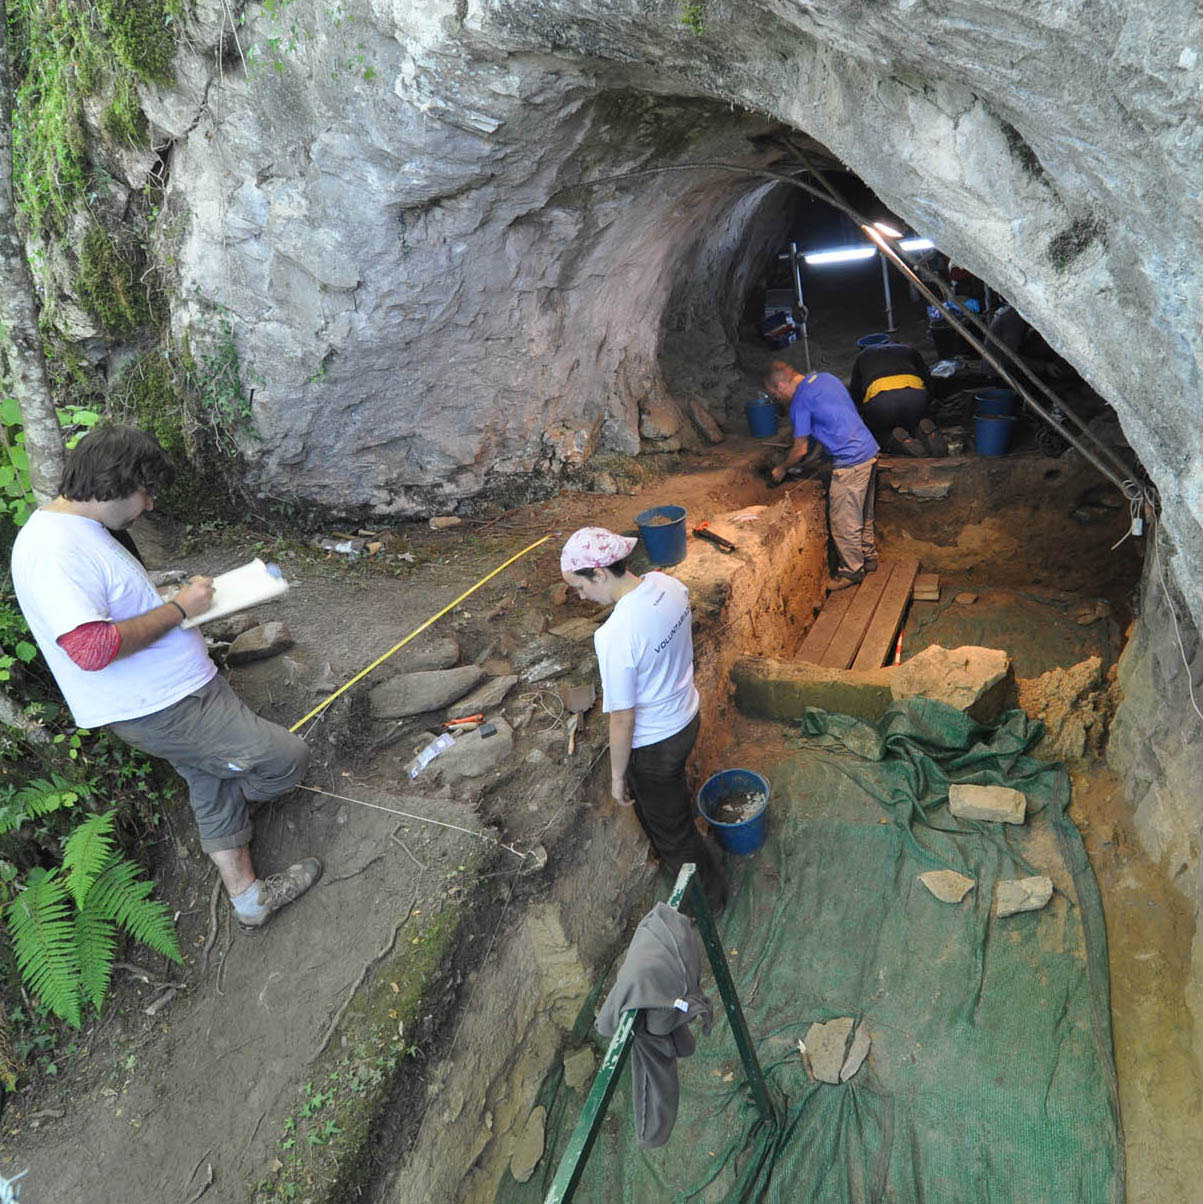 O xacemento de Cova Eirós e o patrimonio arqueo-paleontolóxico das Serras Orientais